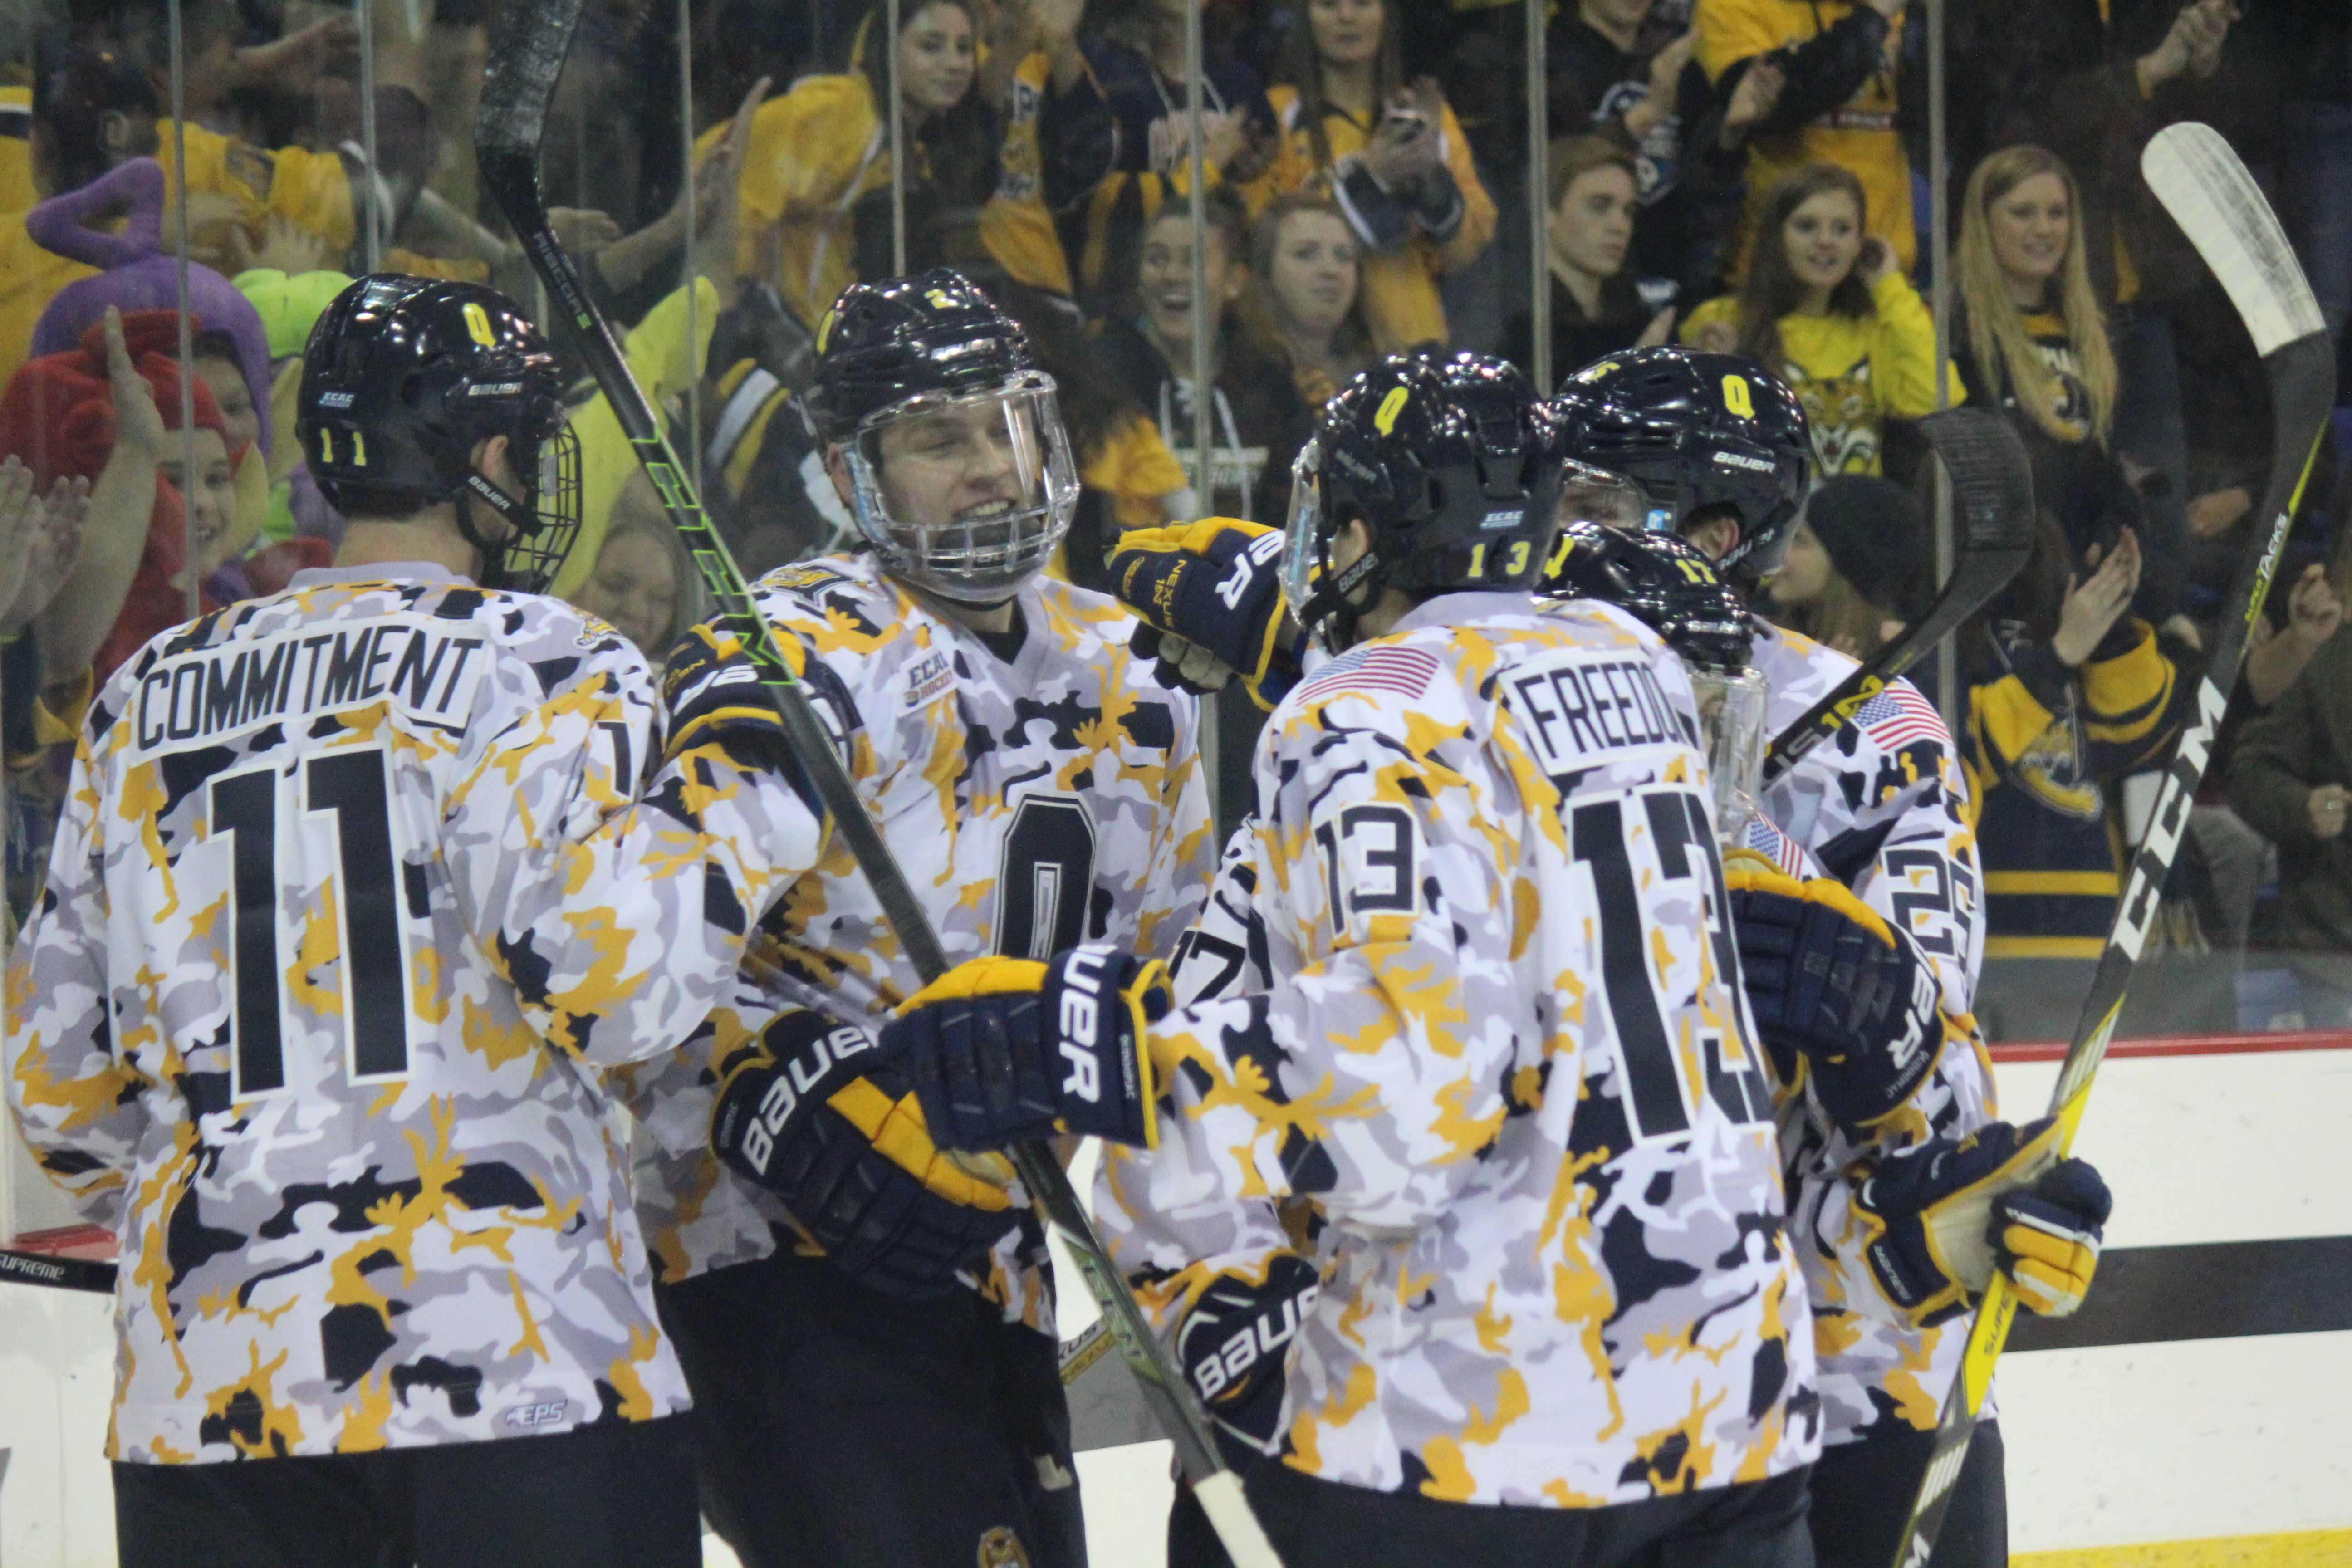 ECAC: Dartmouth Hockey Drops First Of The Season At Quinnipiac